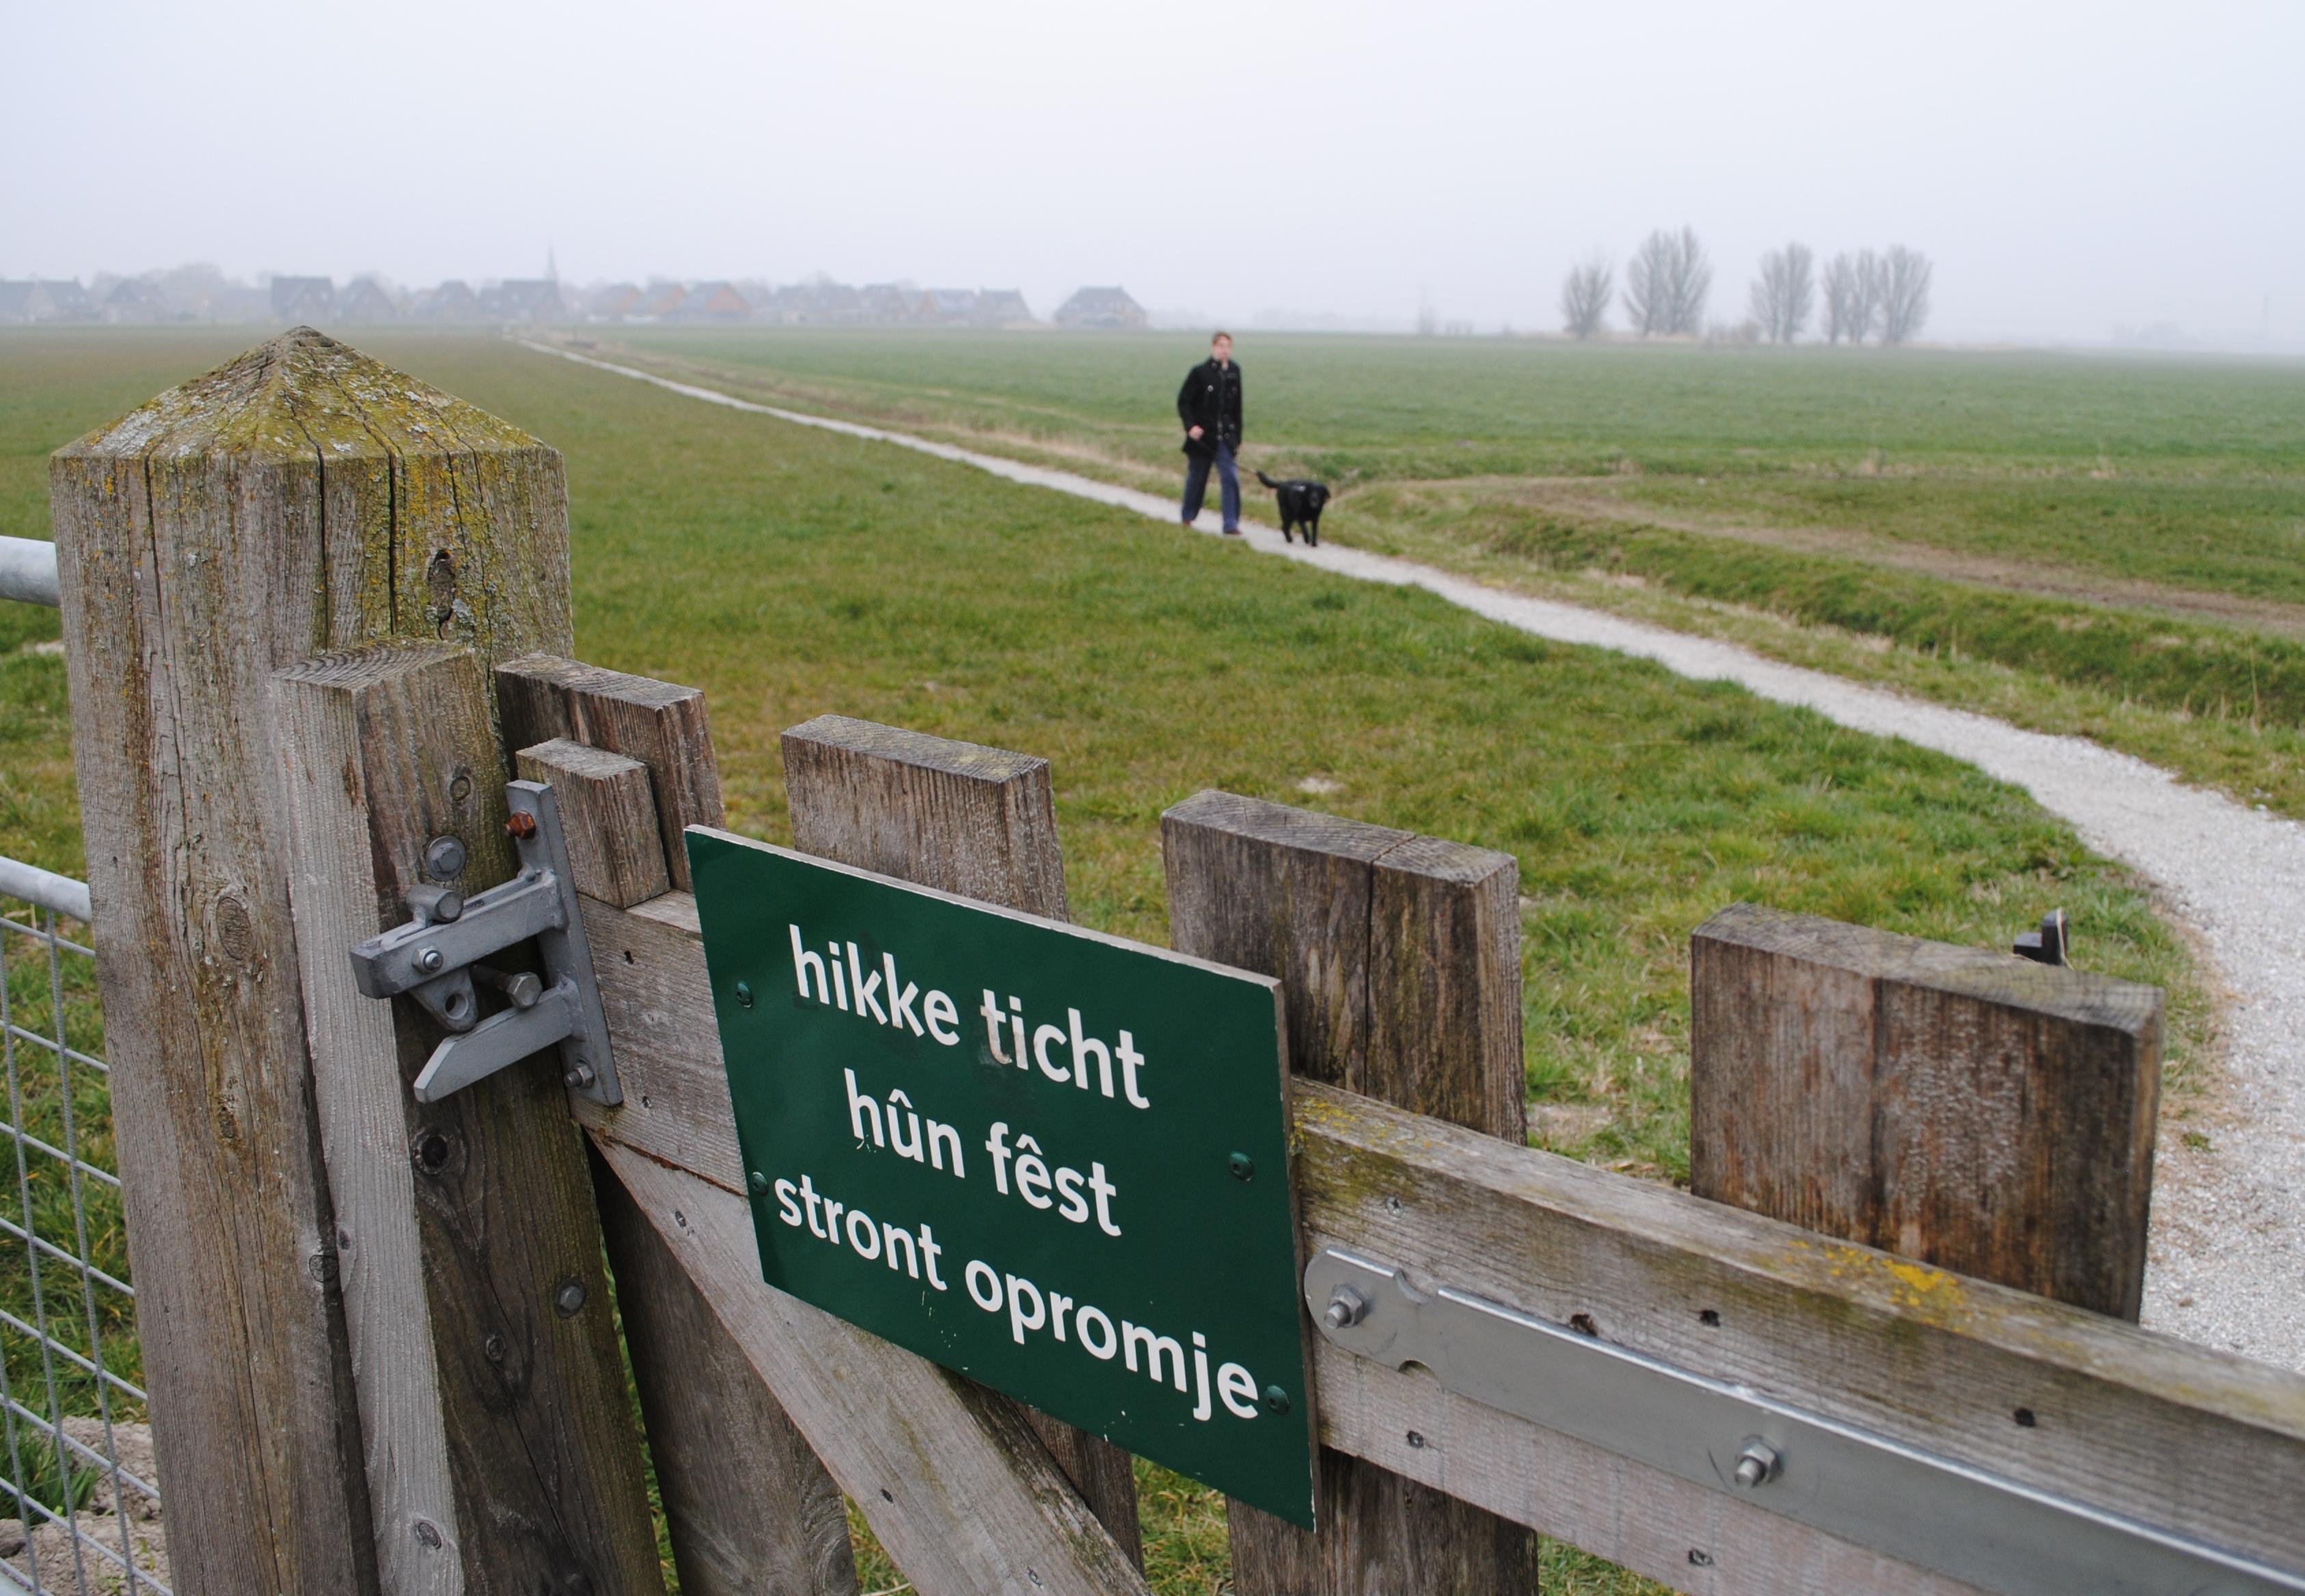 http://www.bistedokter.nl/wp-content/uploads/Neospora-005-Ald-Swinpaad.jpg